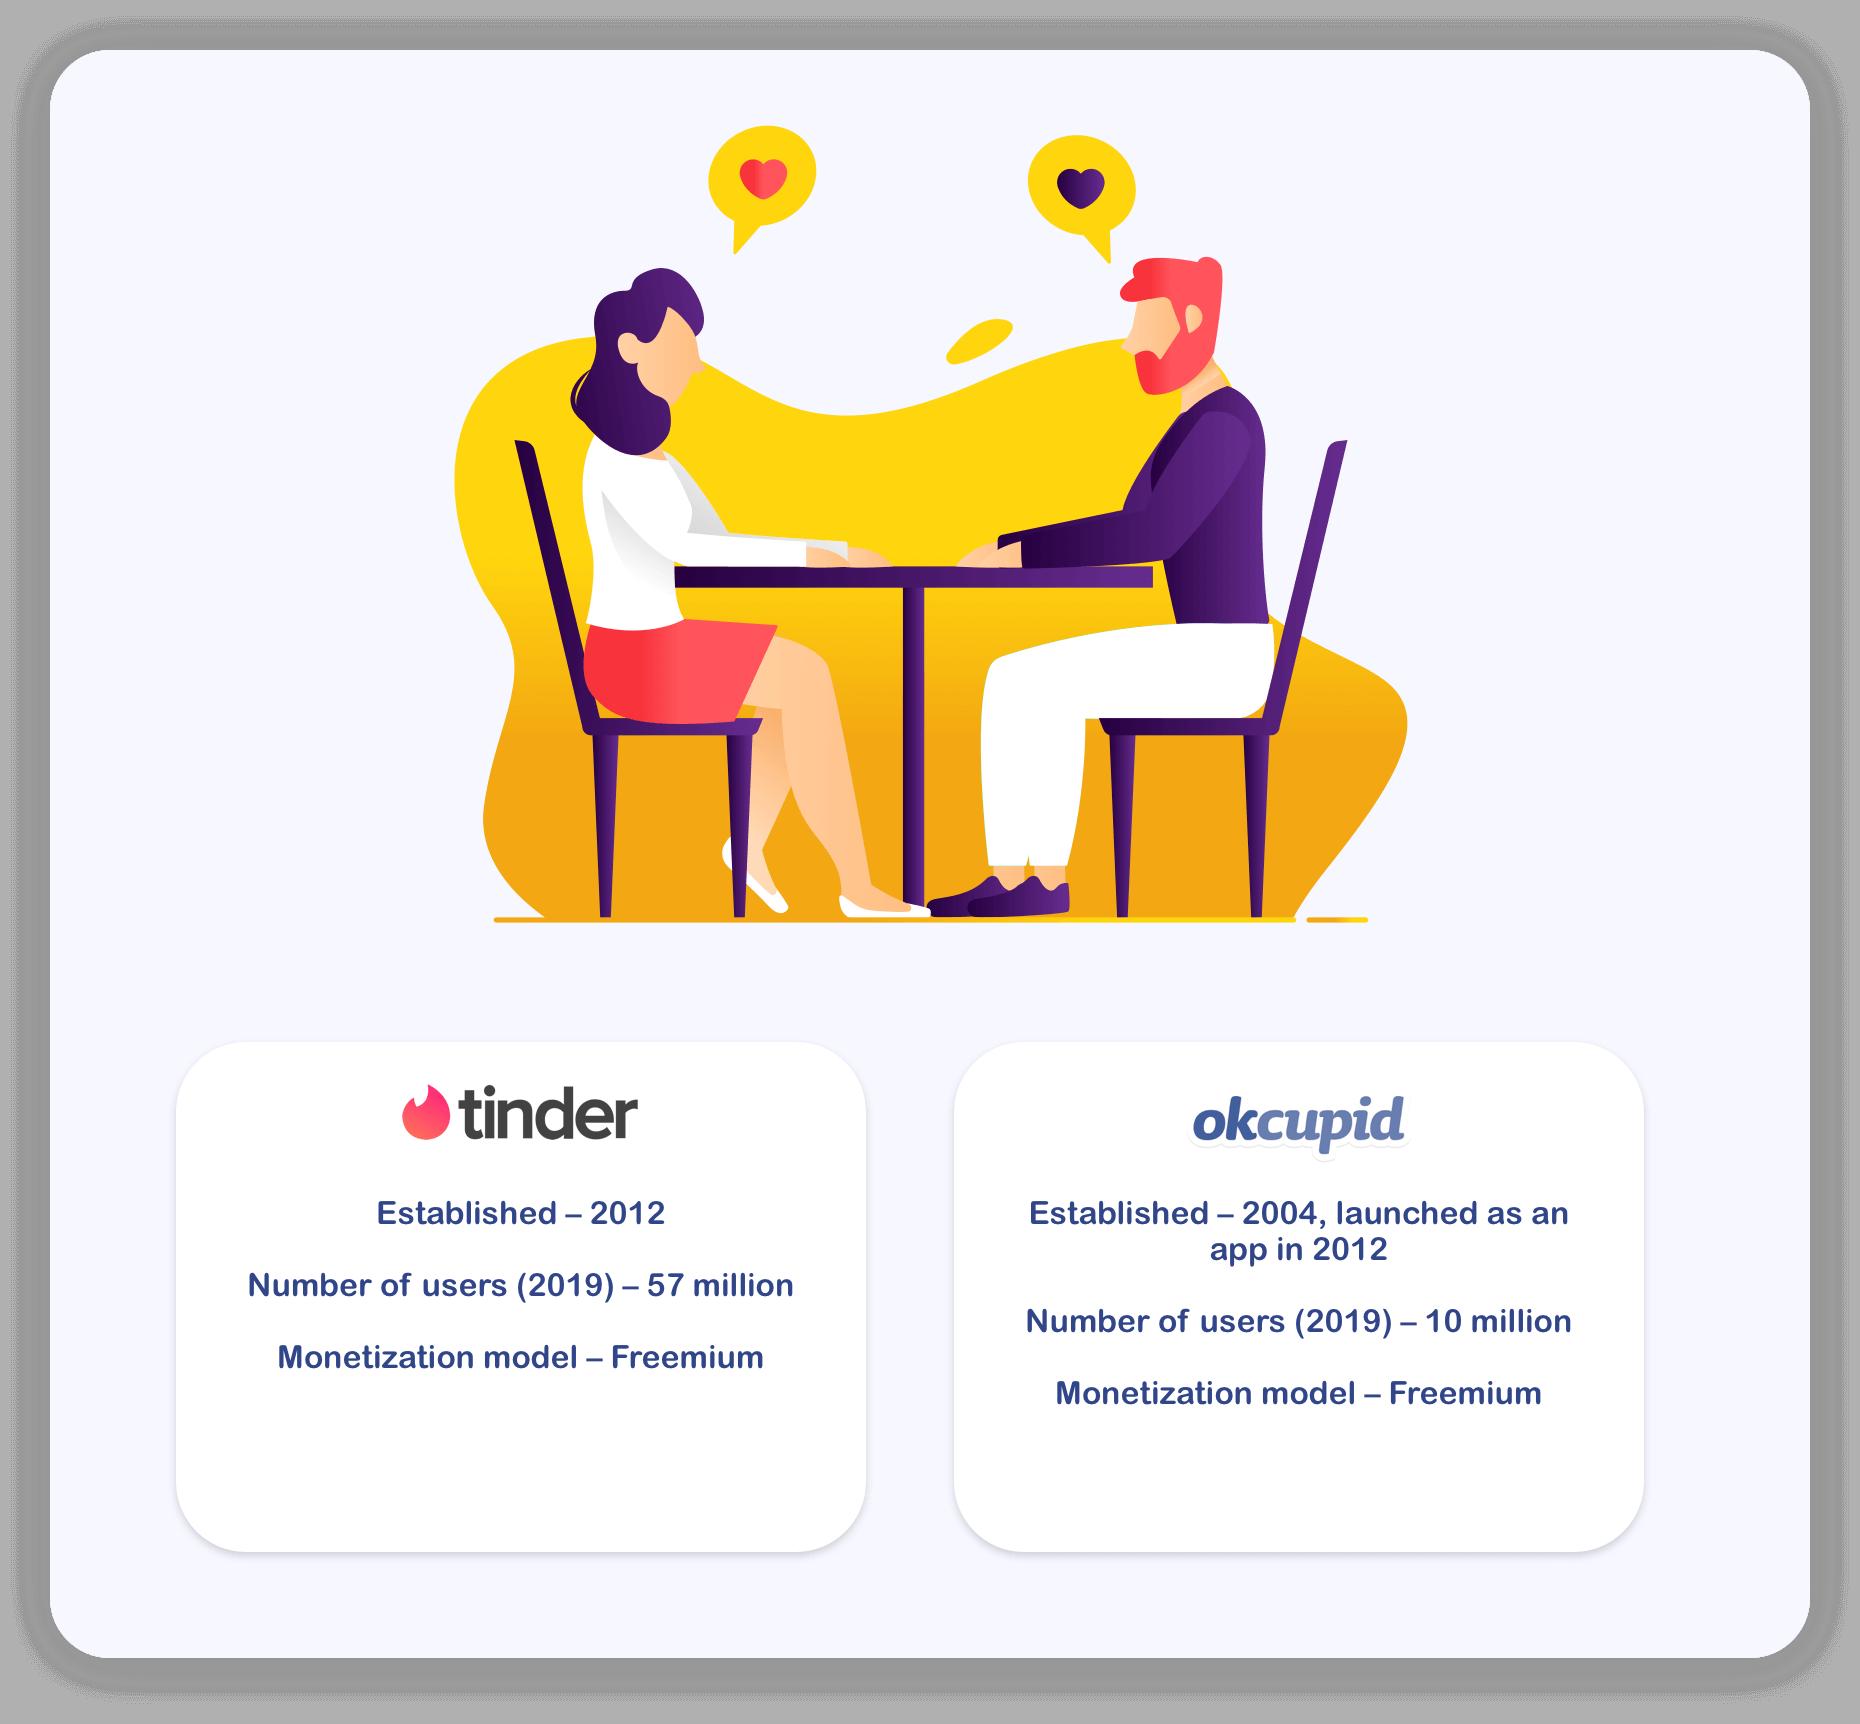 principles and mechanics to build a dating app